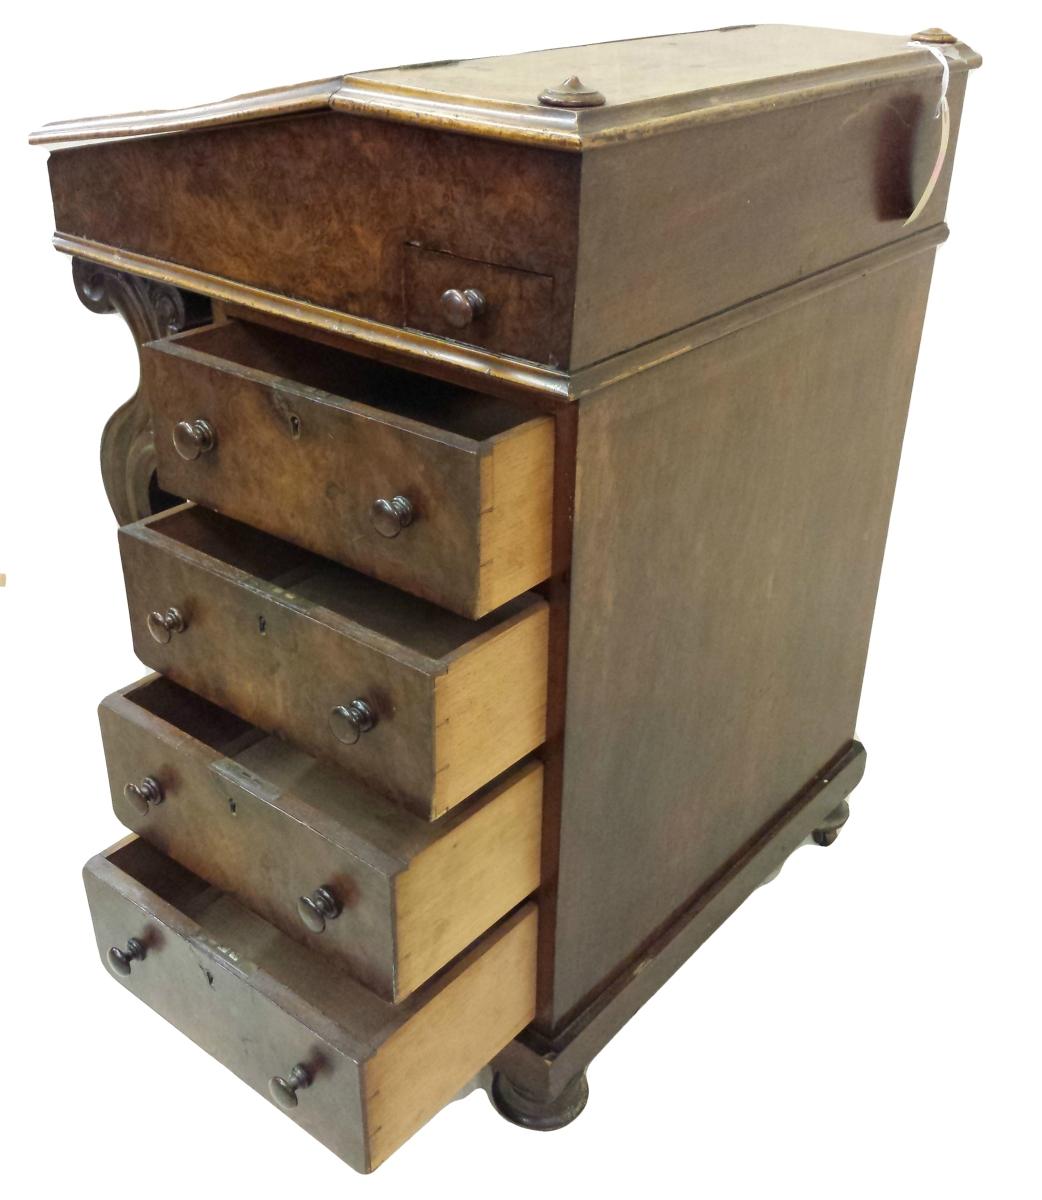 ... Mid Victorian Burr Walnut Davenport Writing Desk ... - Mid Victorian Burr Walnut Davenport Writing Desk - The Antique